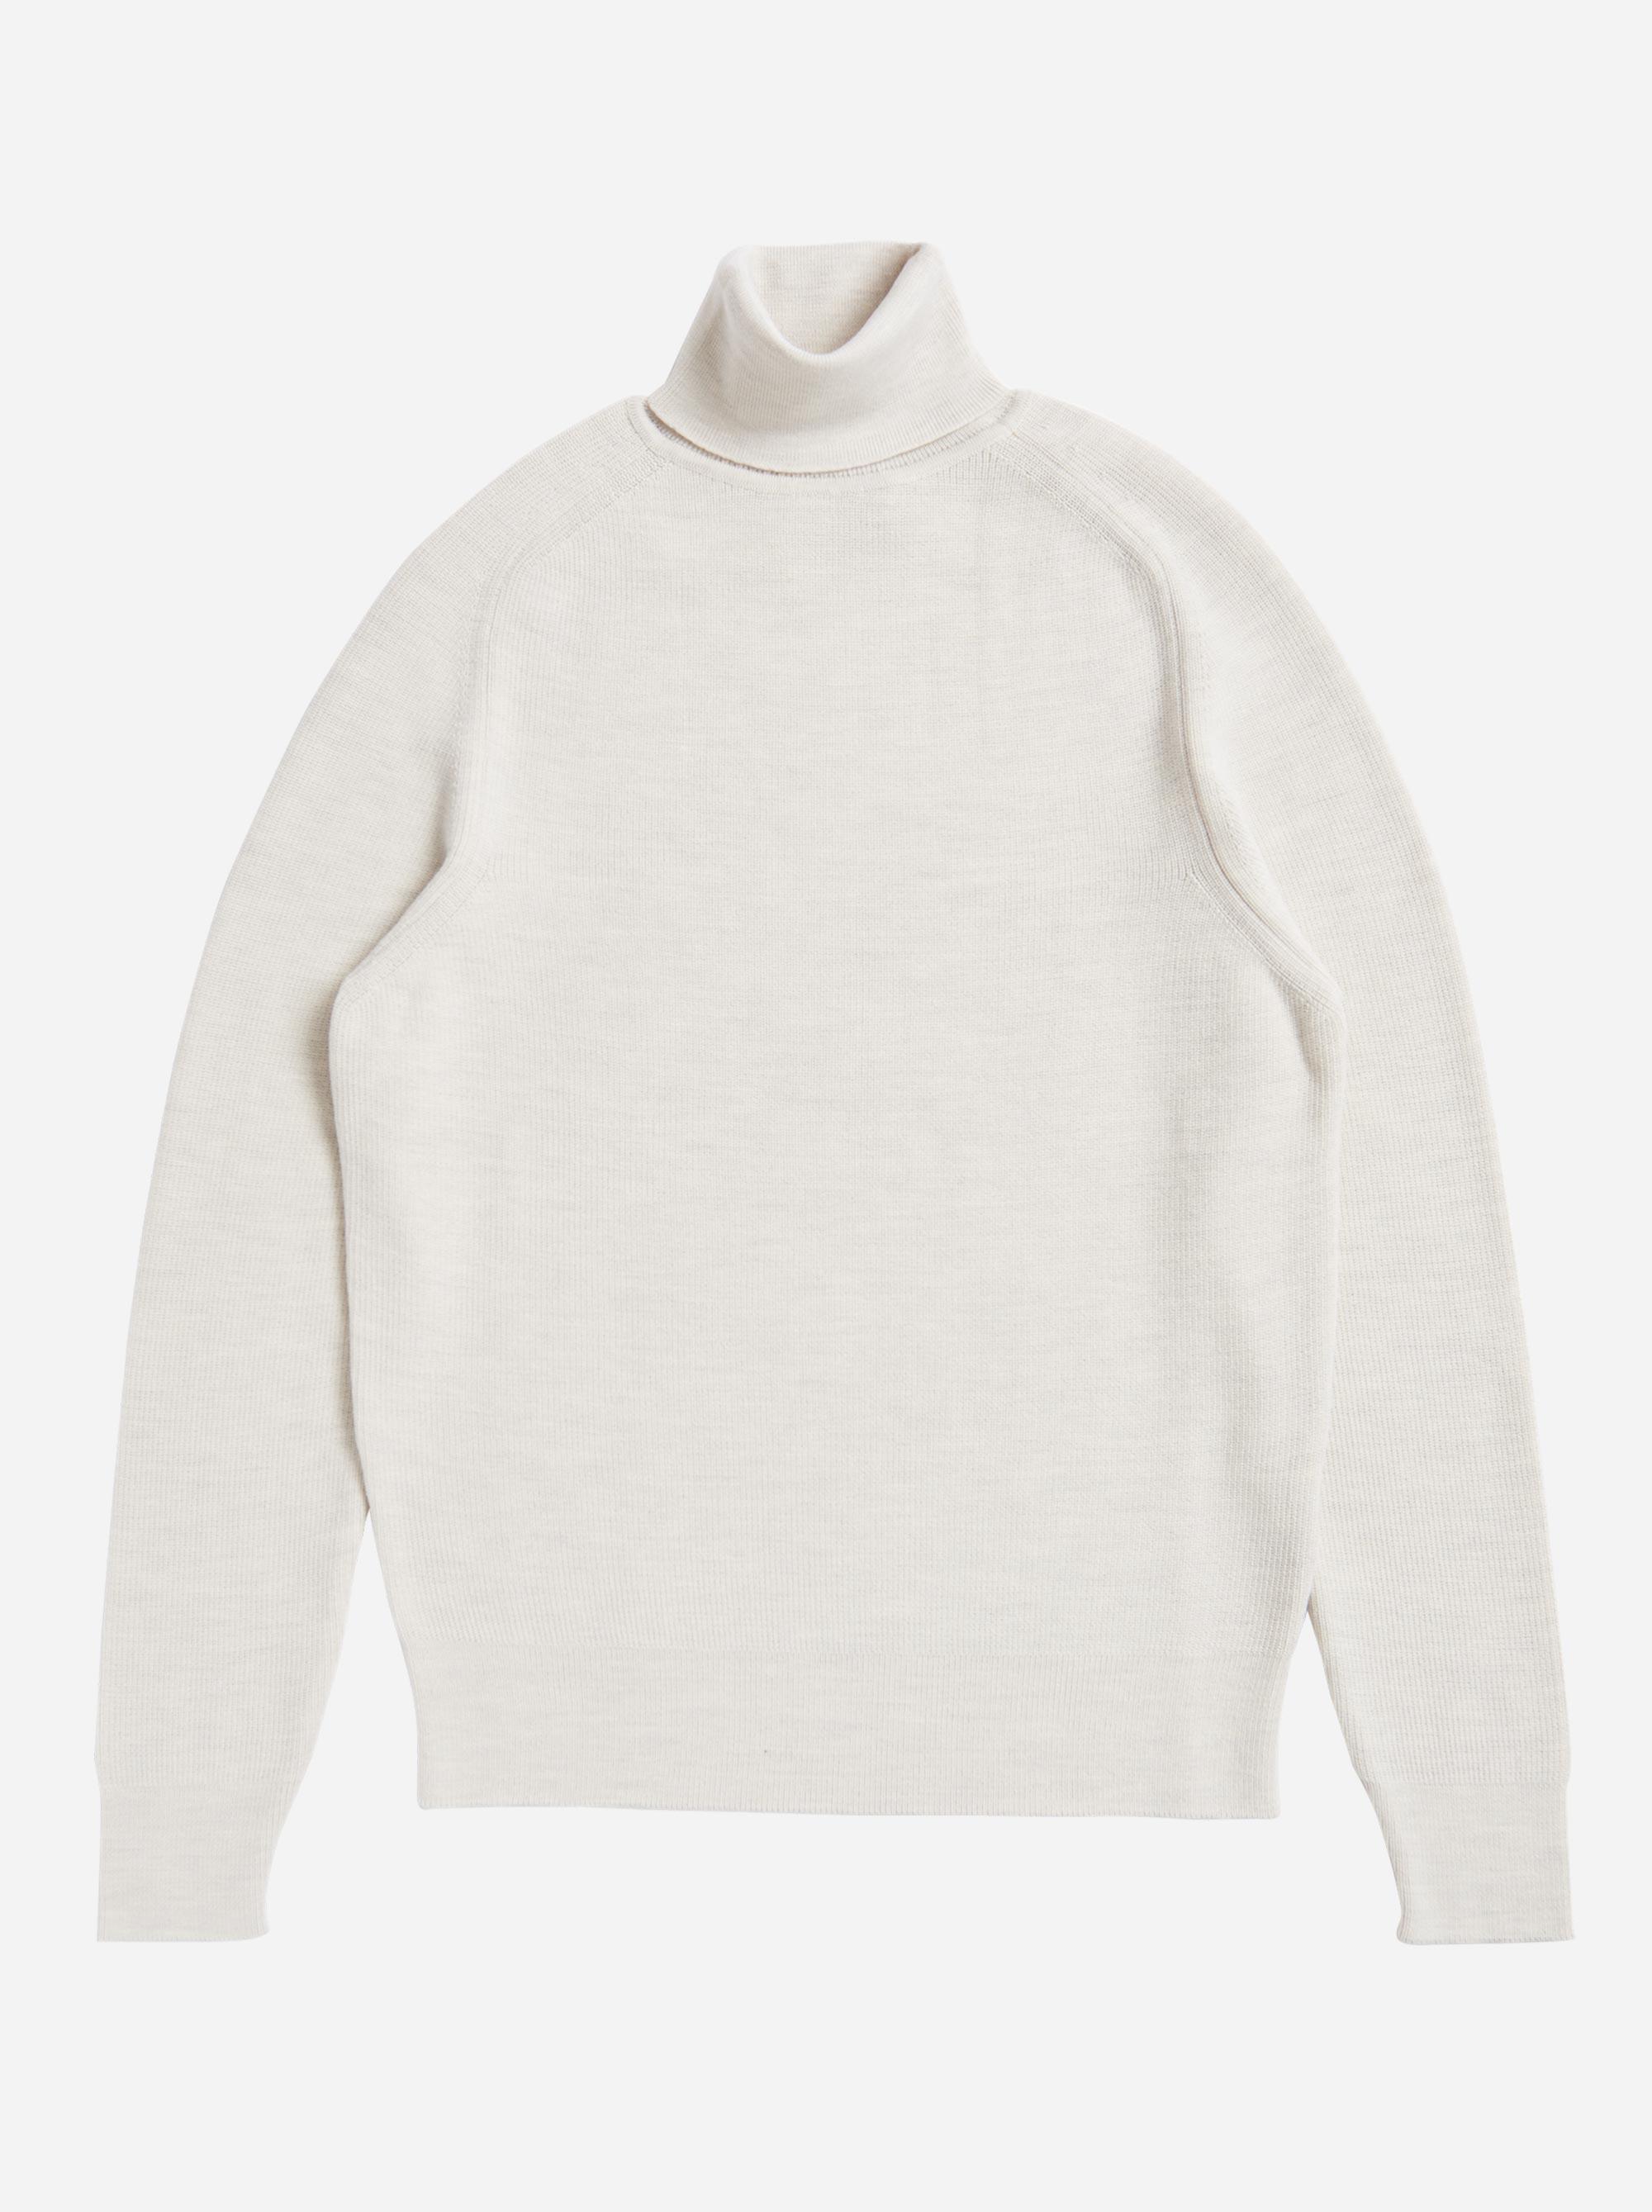 Teym - Turtleneck - The Merino Sweater - Men - White - 6